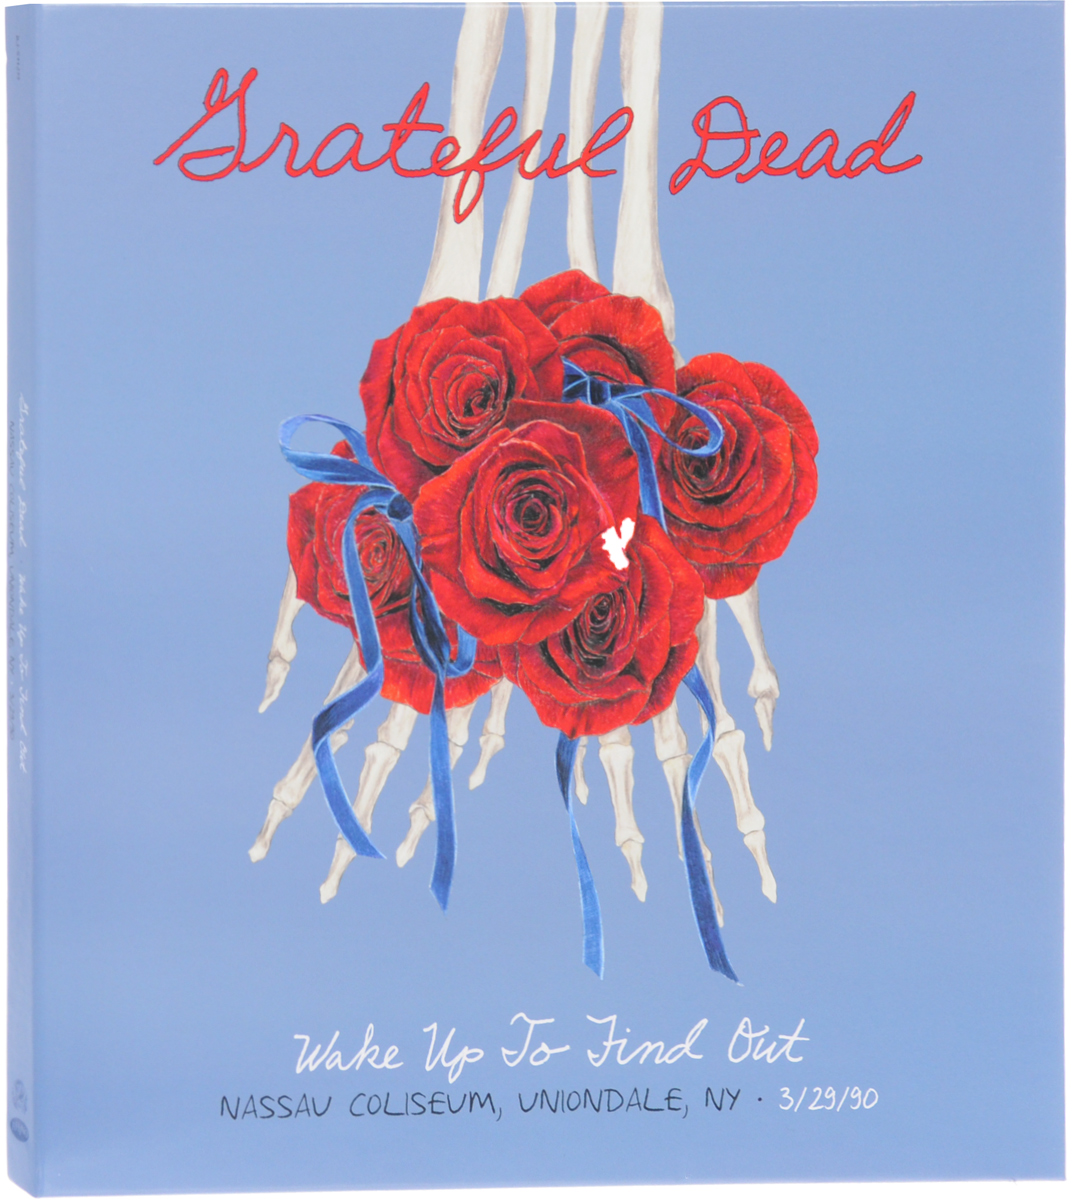 """The Grateful Dead"" Grateful Dead. Wake Up To Find Out. Nassau Coliseum, Uniondale, NY 3/29/90 (5 LP)"